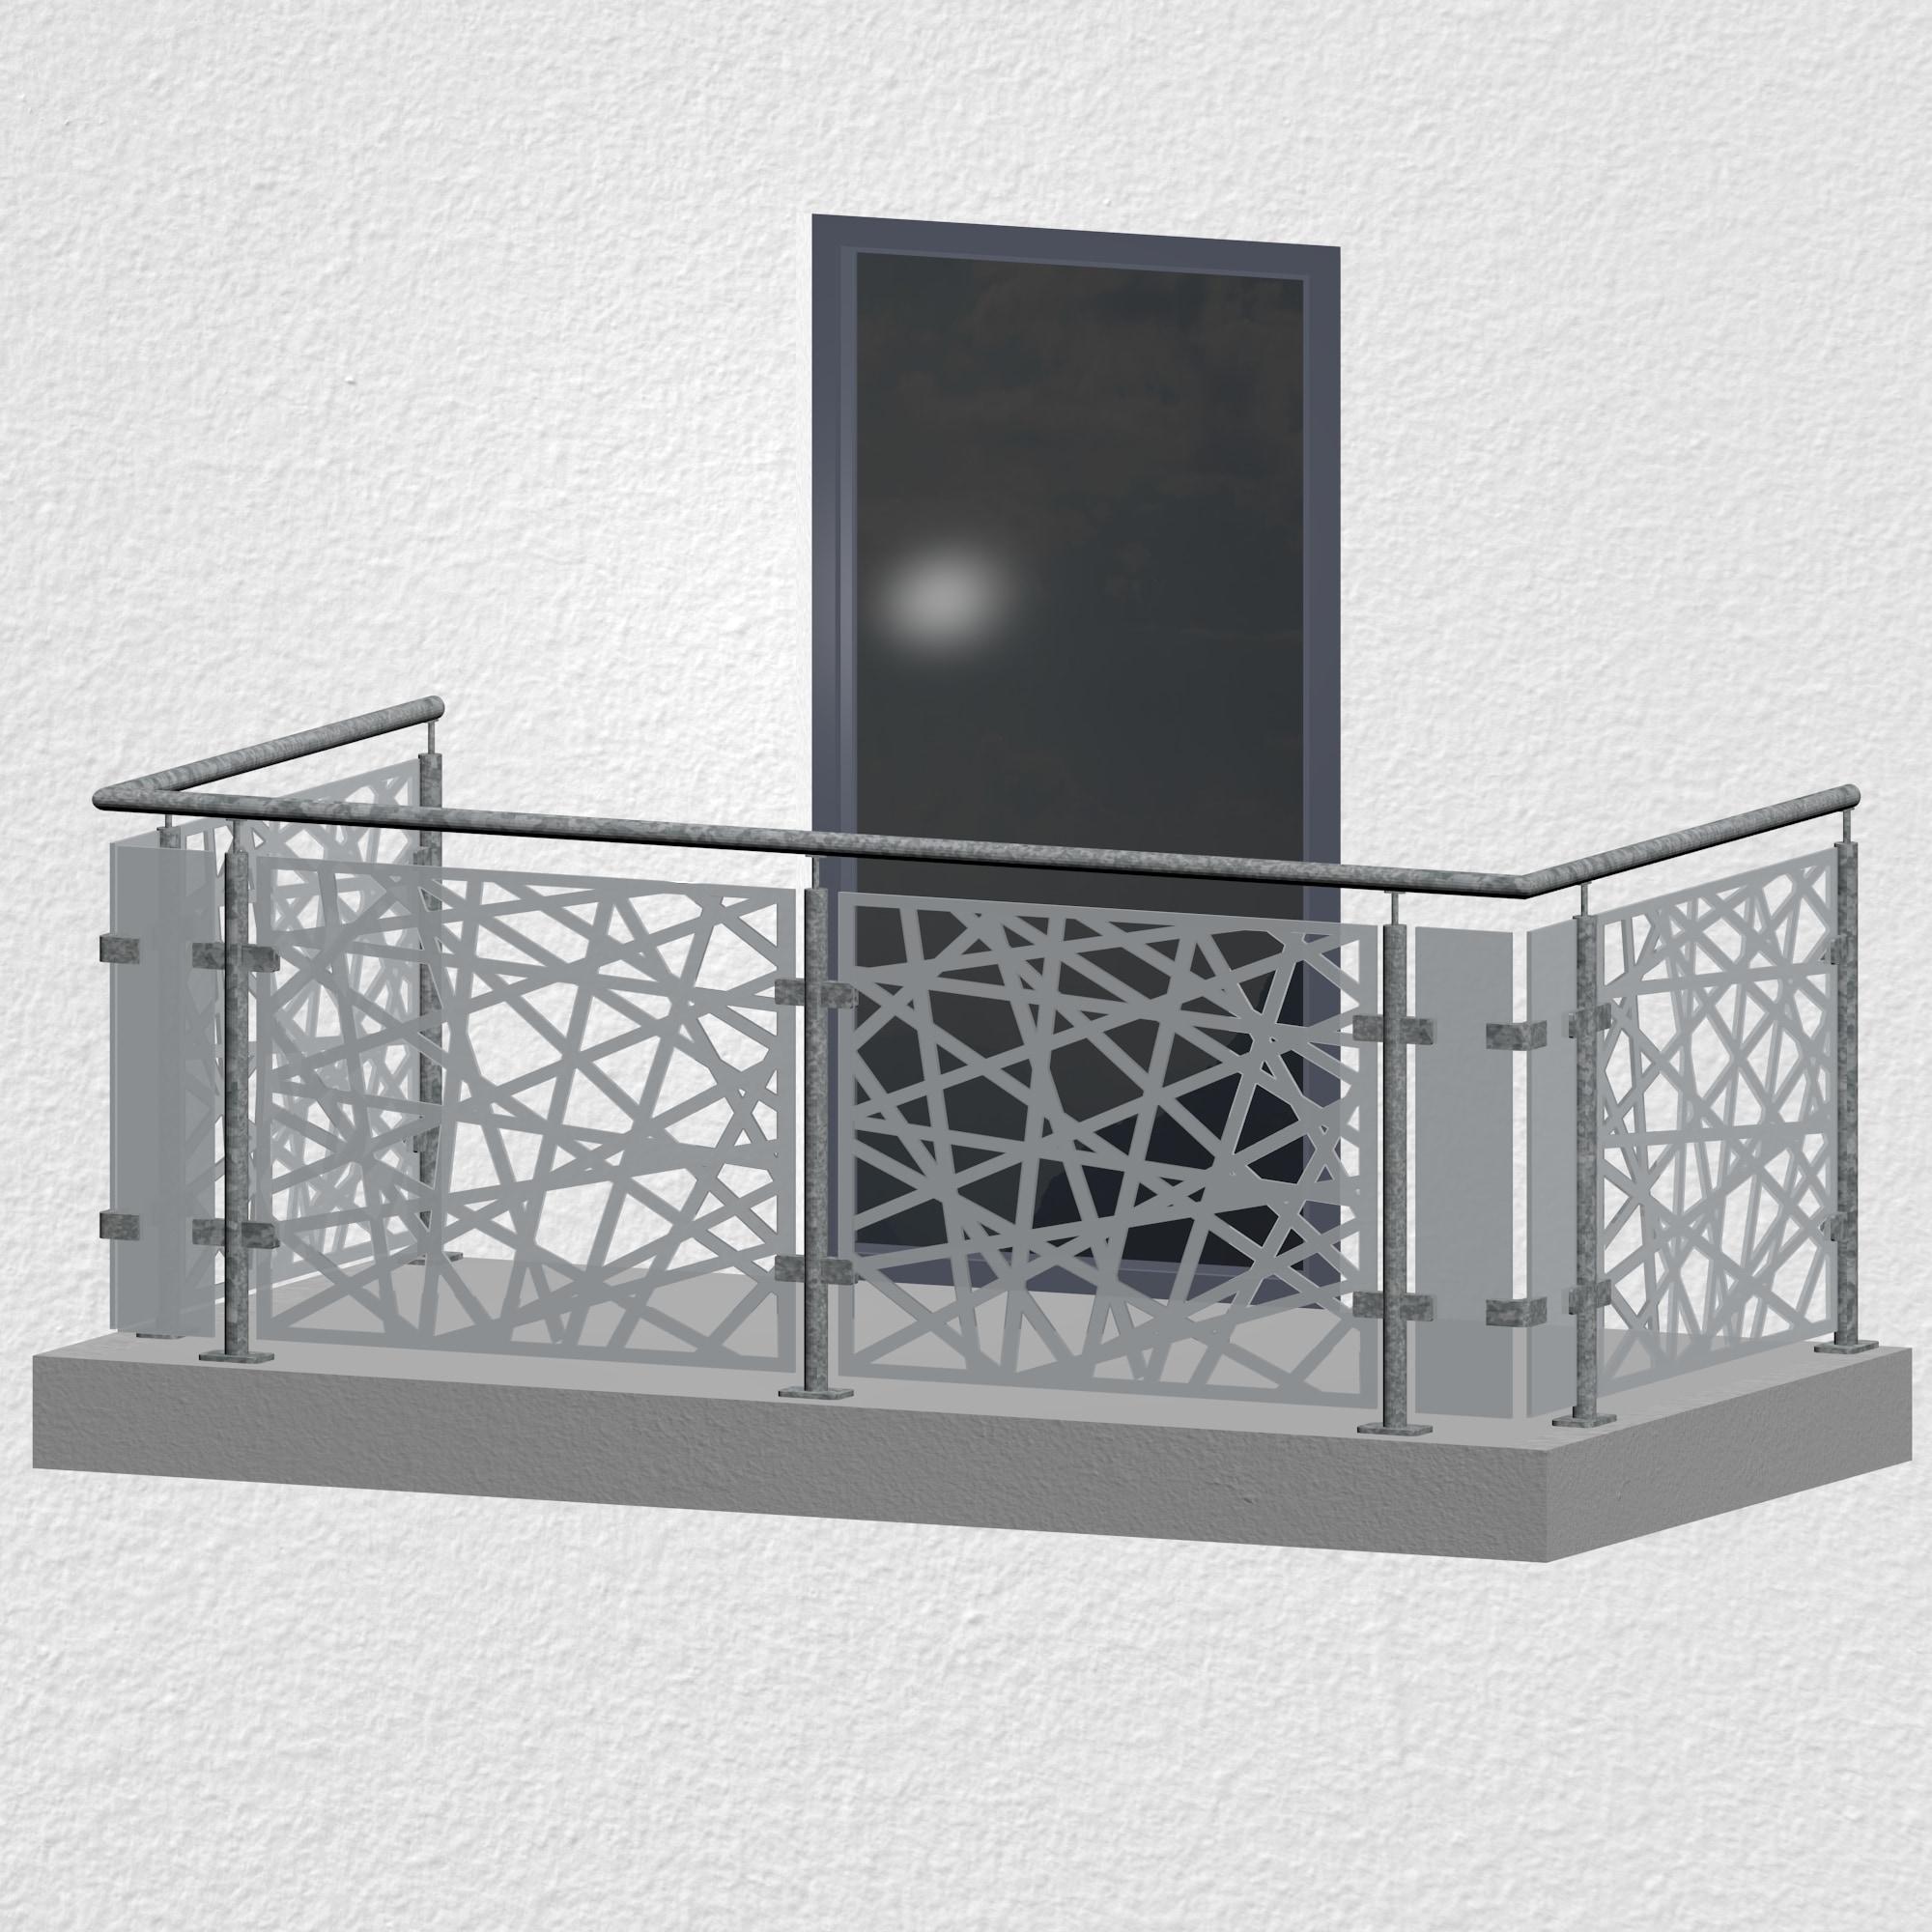 Balkongeländer verzinkt Designglas AB 1 MO